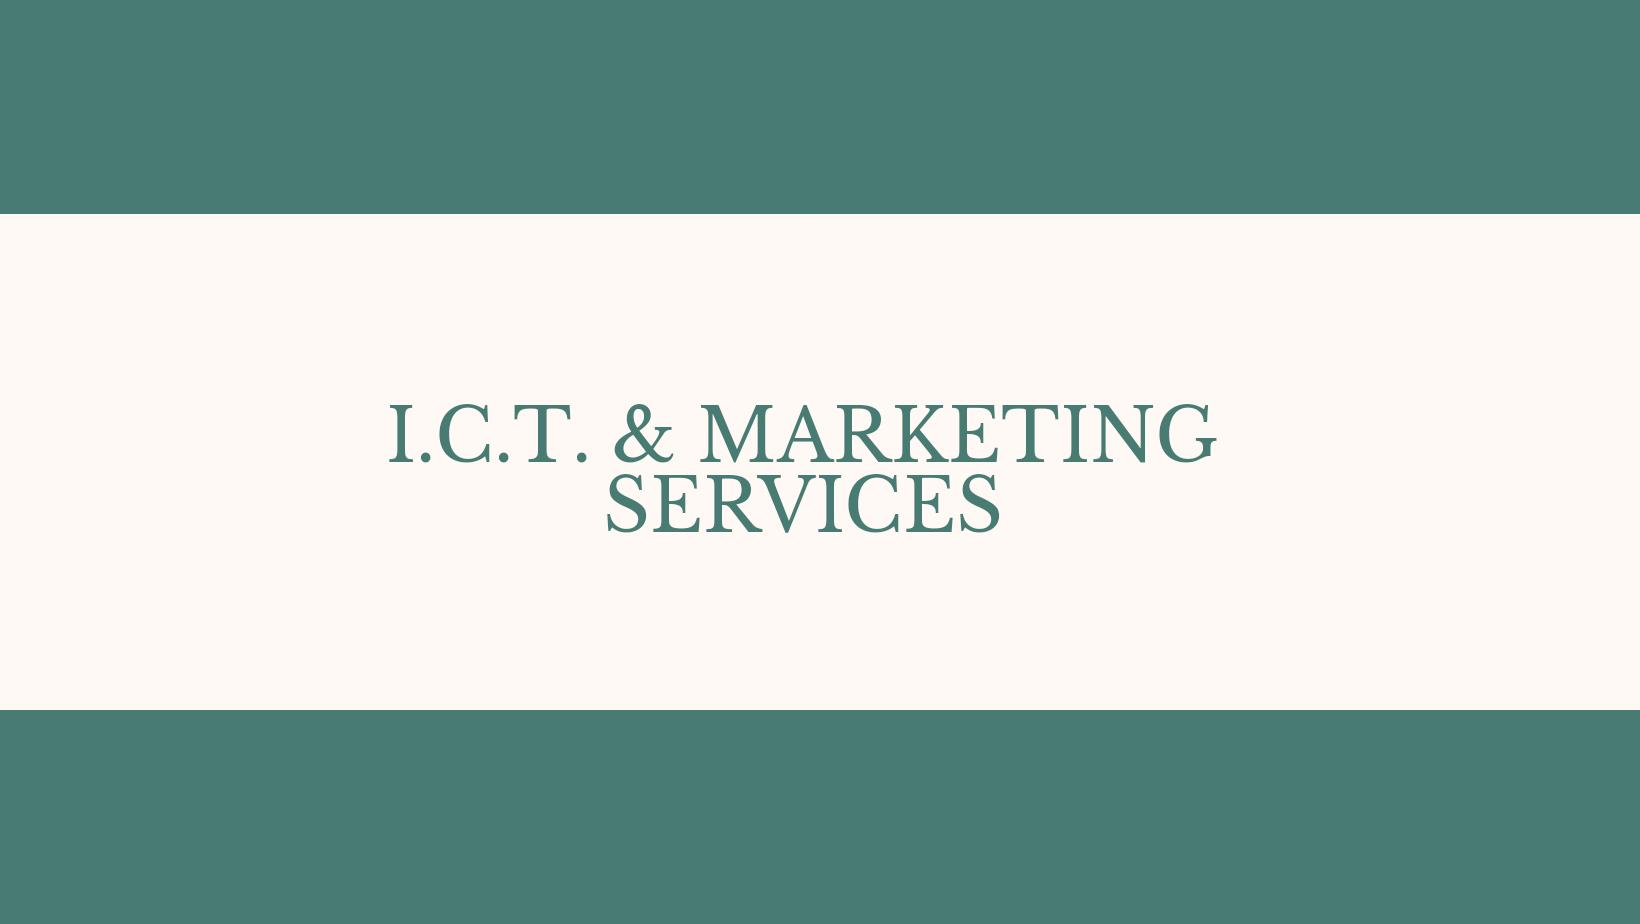 I.C.T. & Marketing